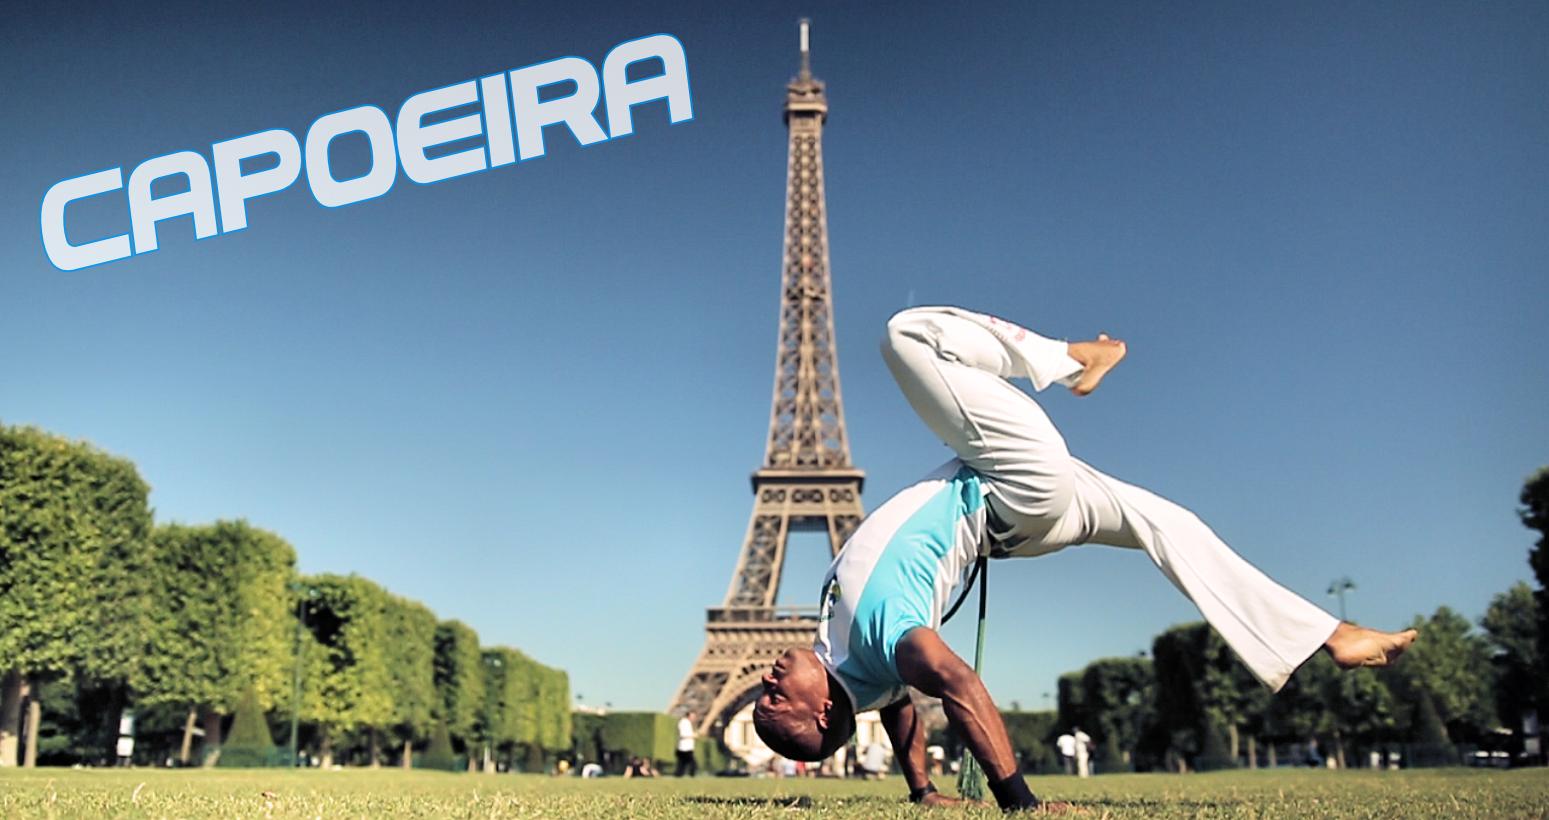 capoeira-paris-planche-cygne-eiffel